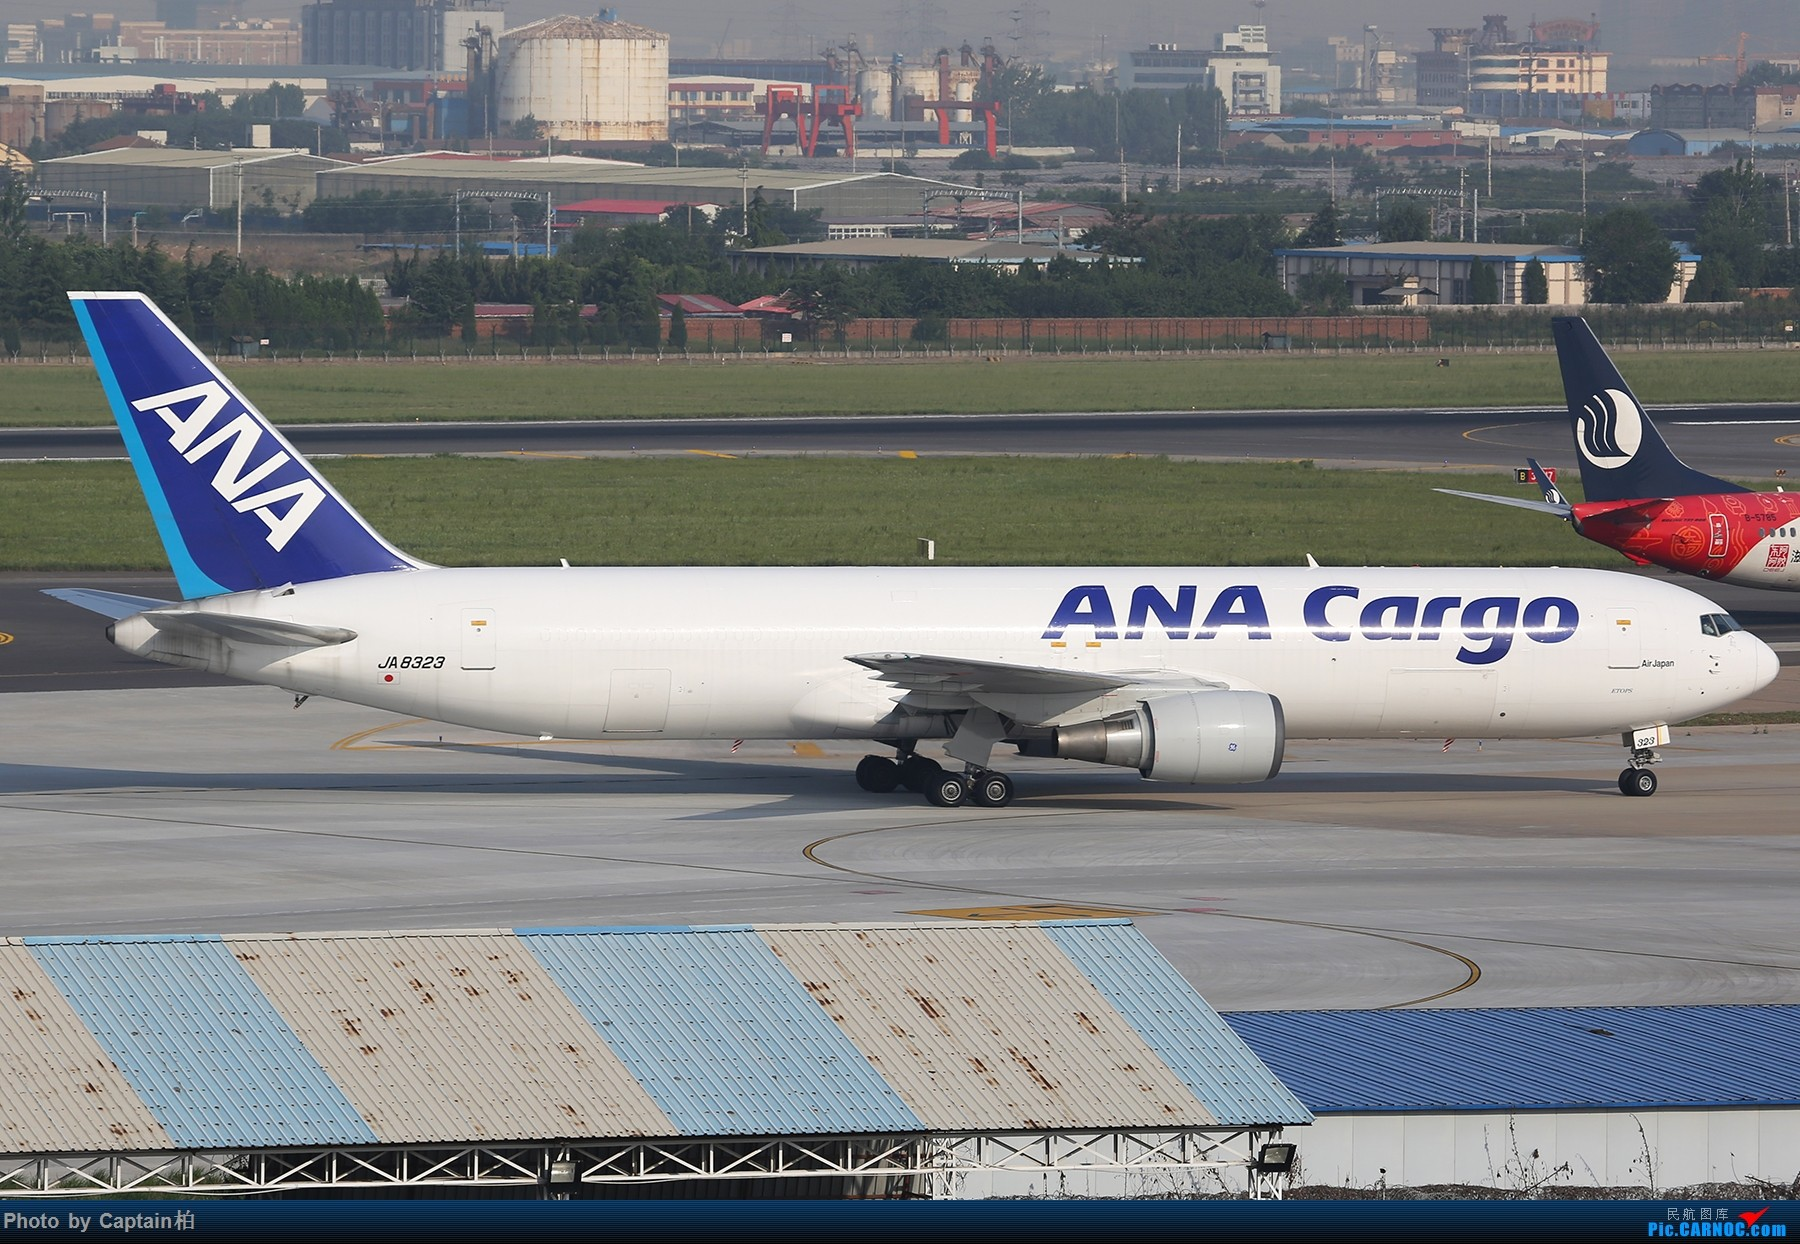 Re:[原创]青岛随拍 BOEING 767-300ER JA8232 中国青岛流亭国际机场